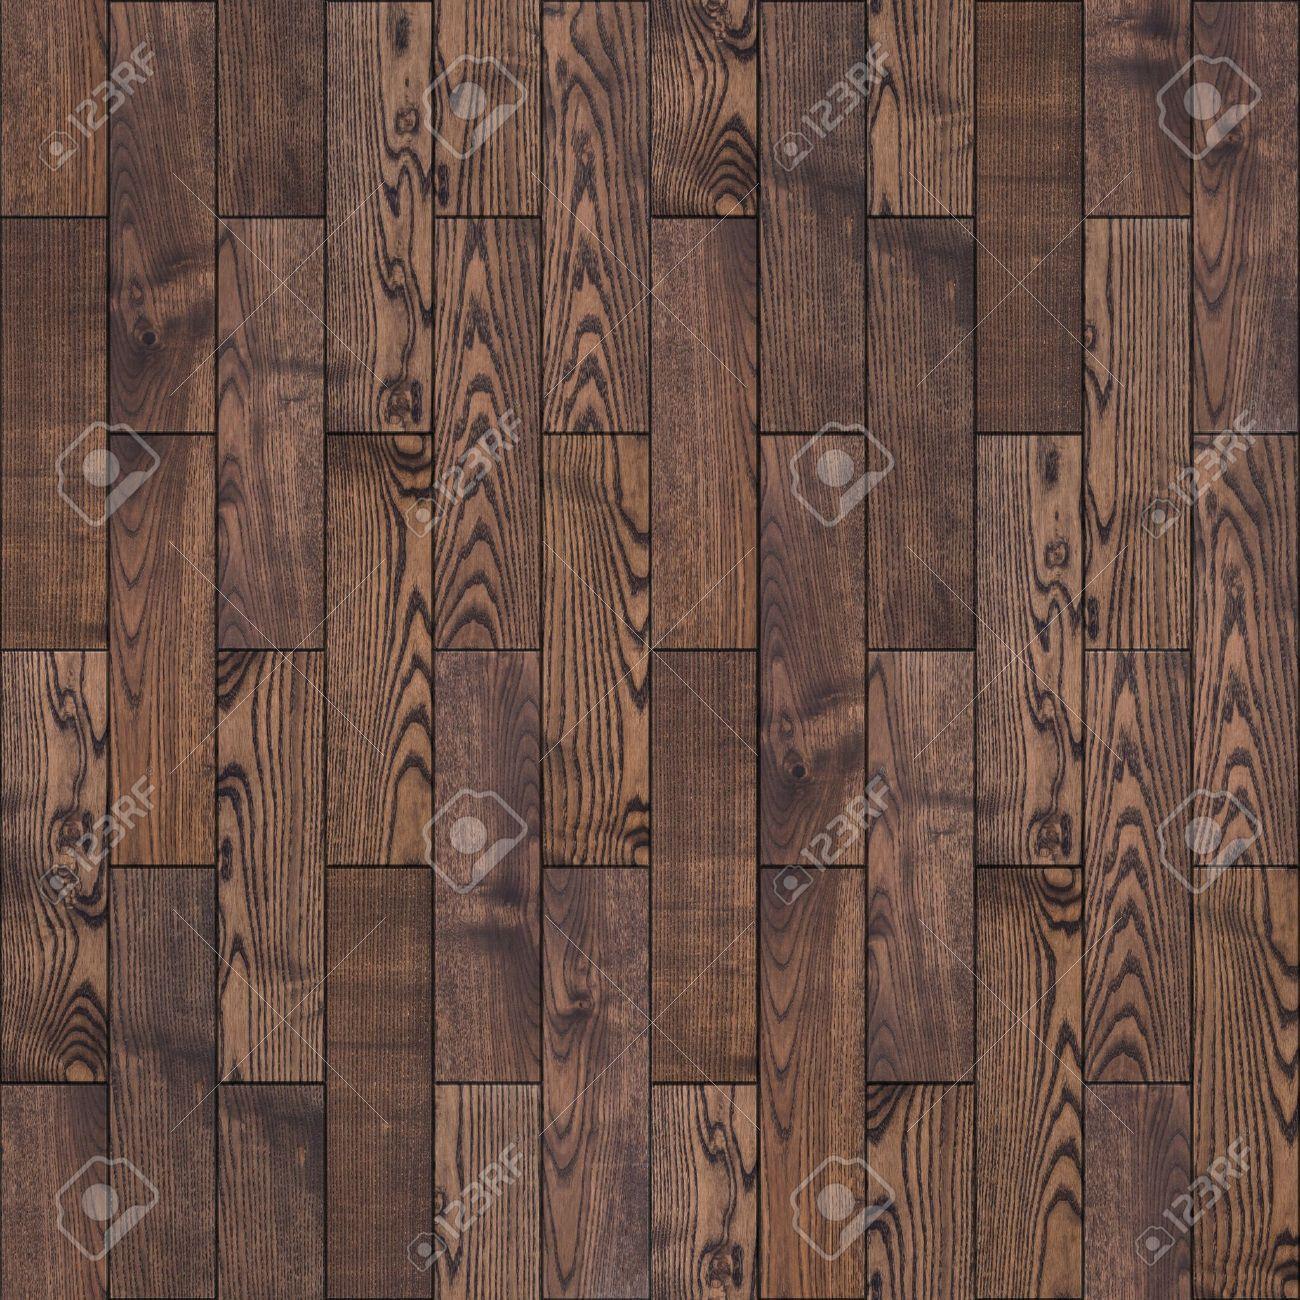 marrn madera parquet floor muy detallada textura inconstil de tileable foto de archivo